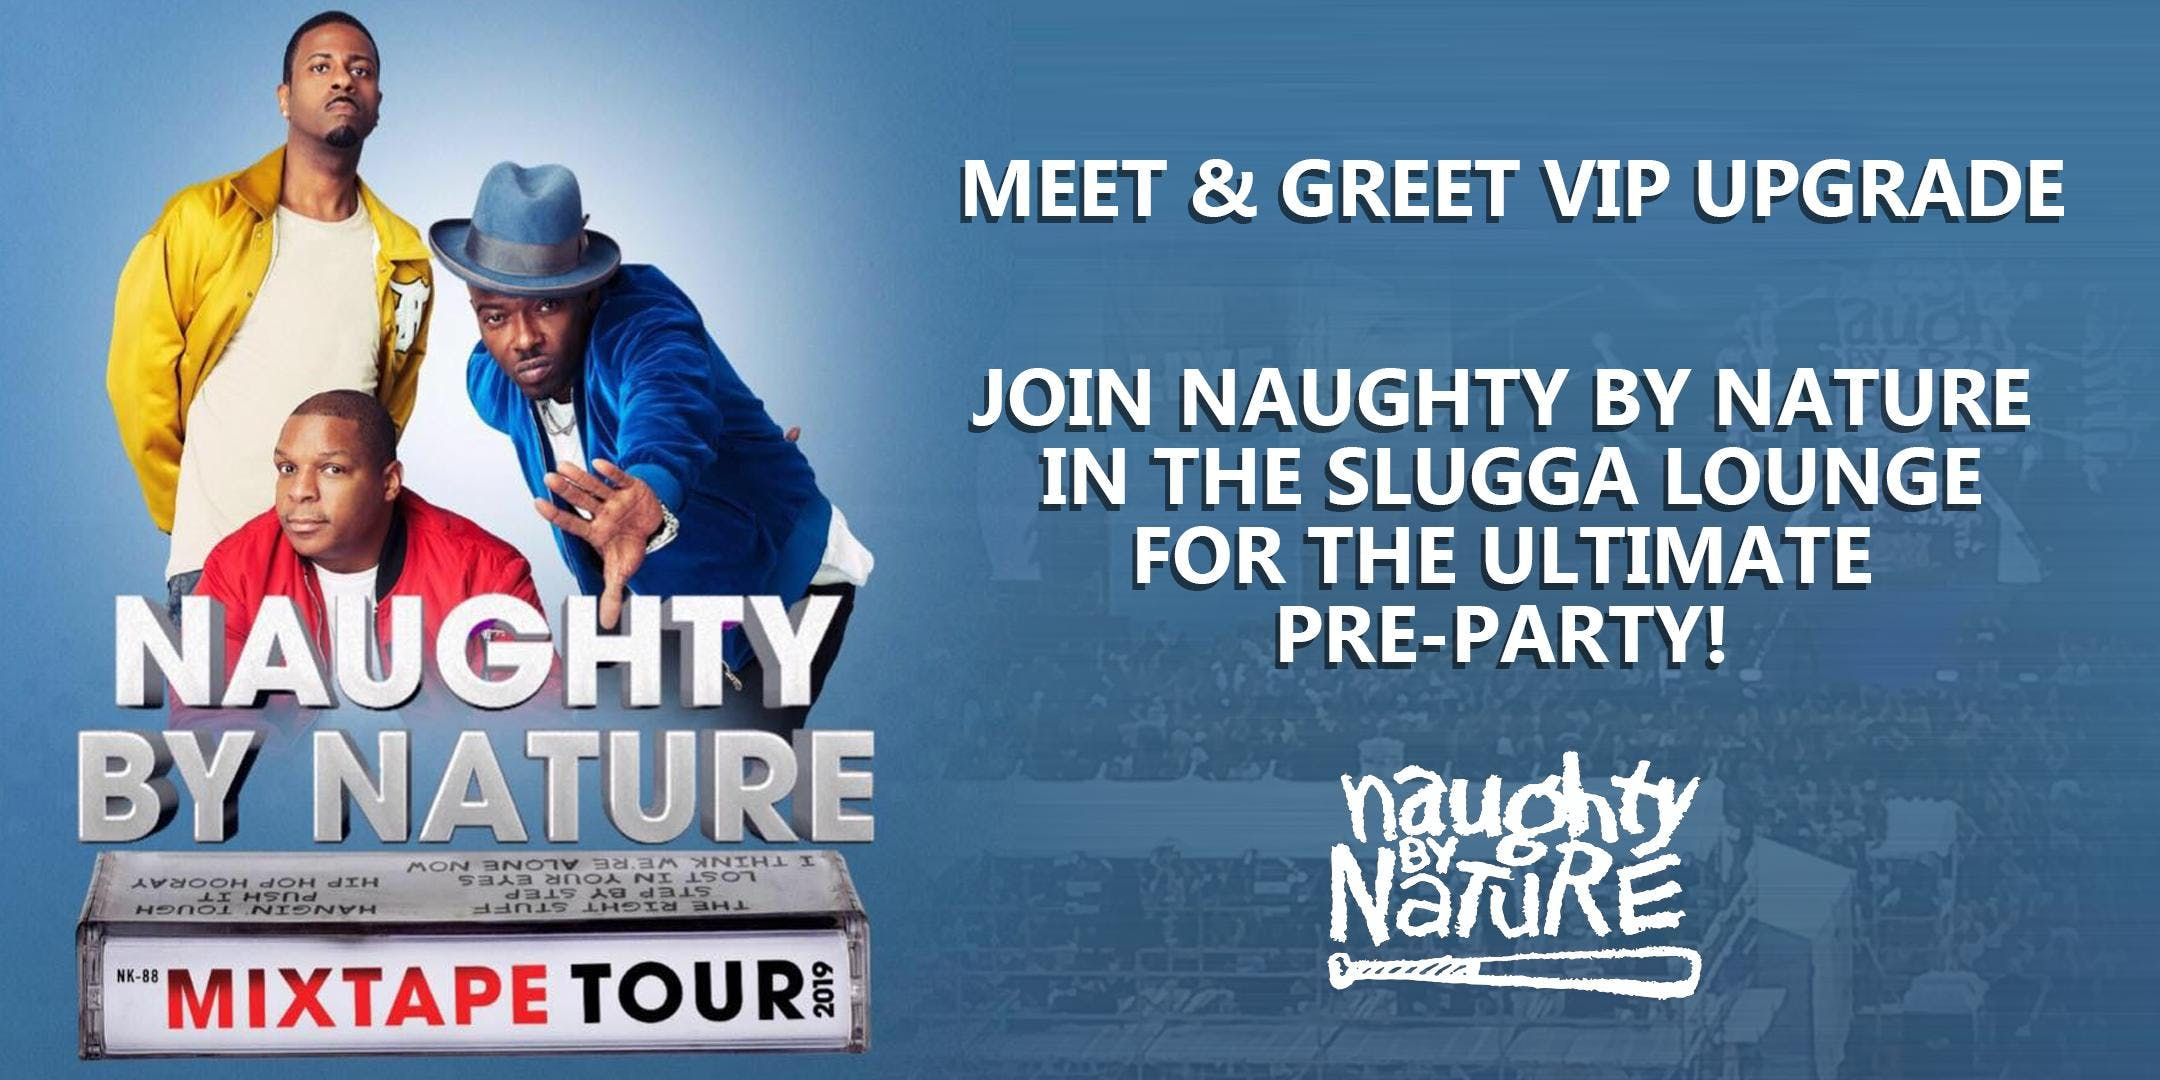 NAUGHTY BY NATURE MEET + GREET UPGRADE - Phoenix -